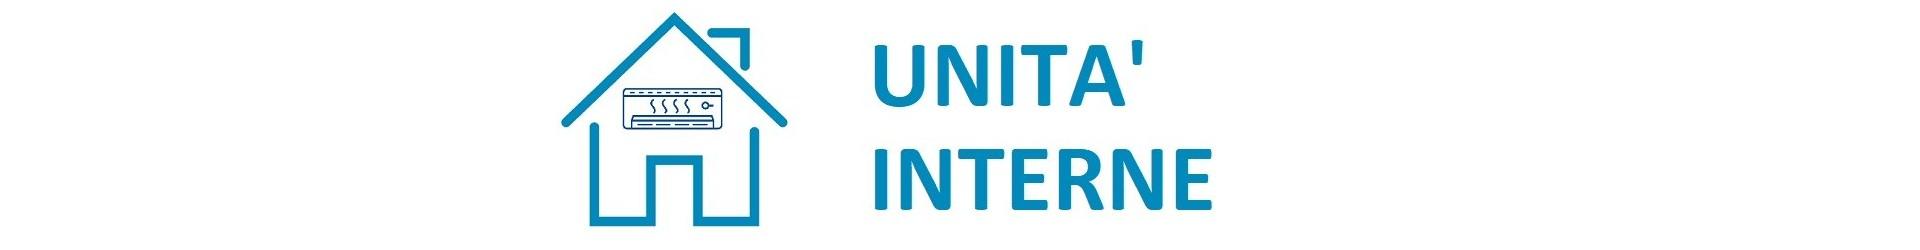 Unità interna Toshiba